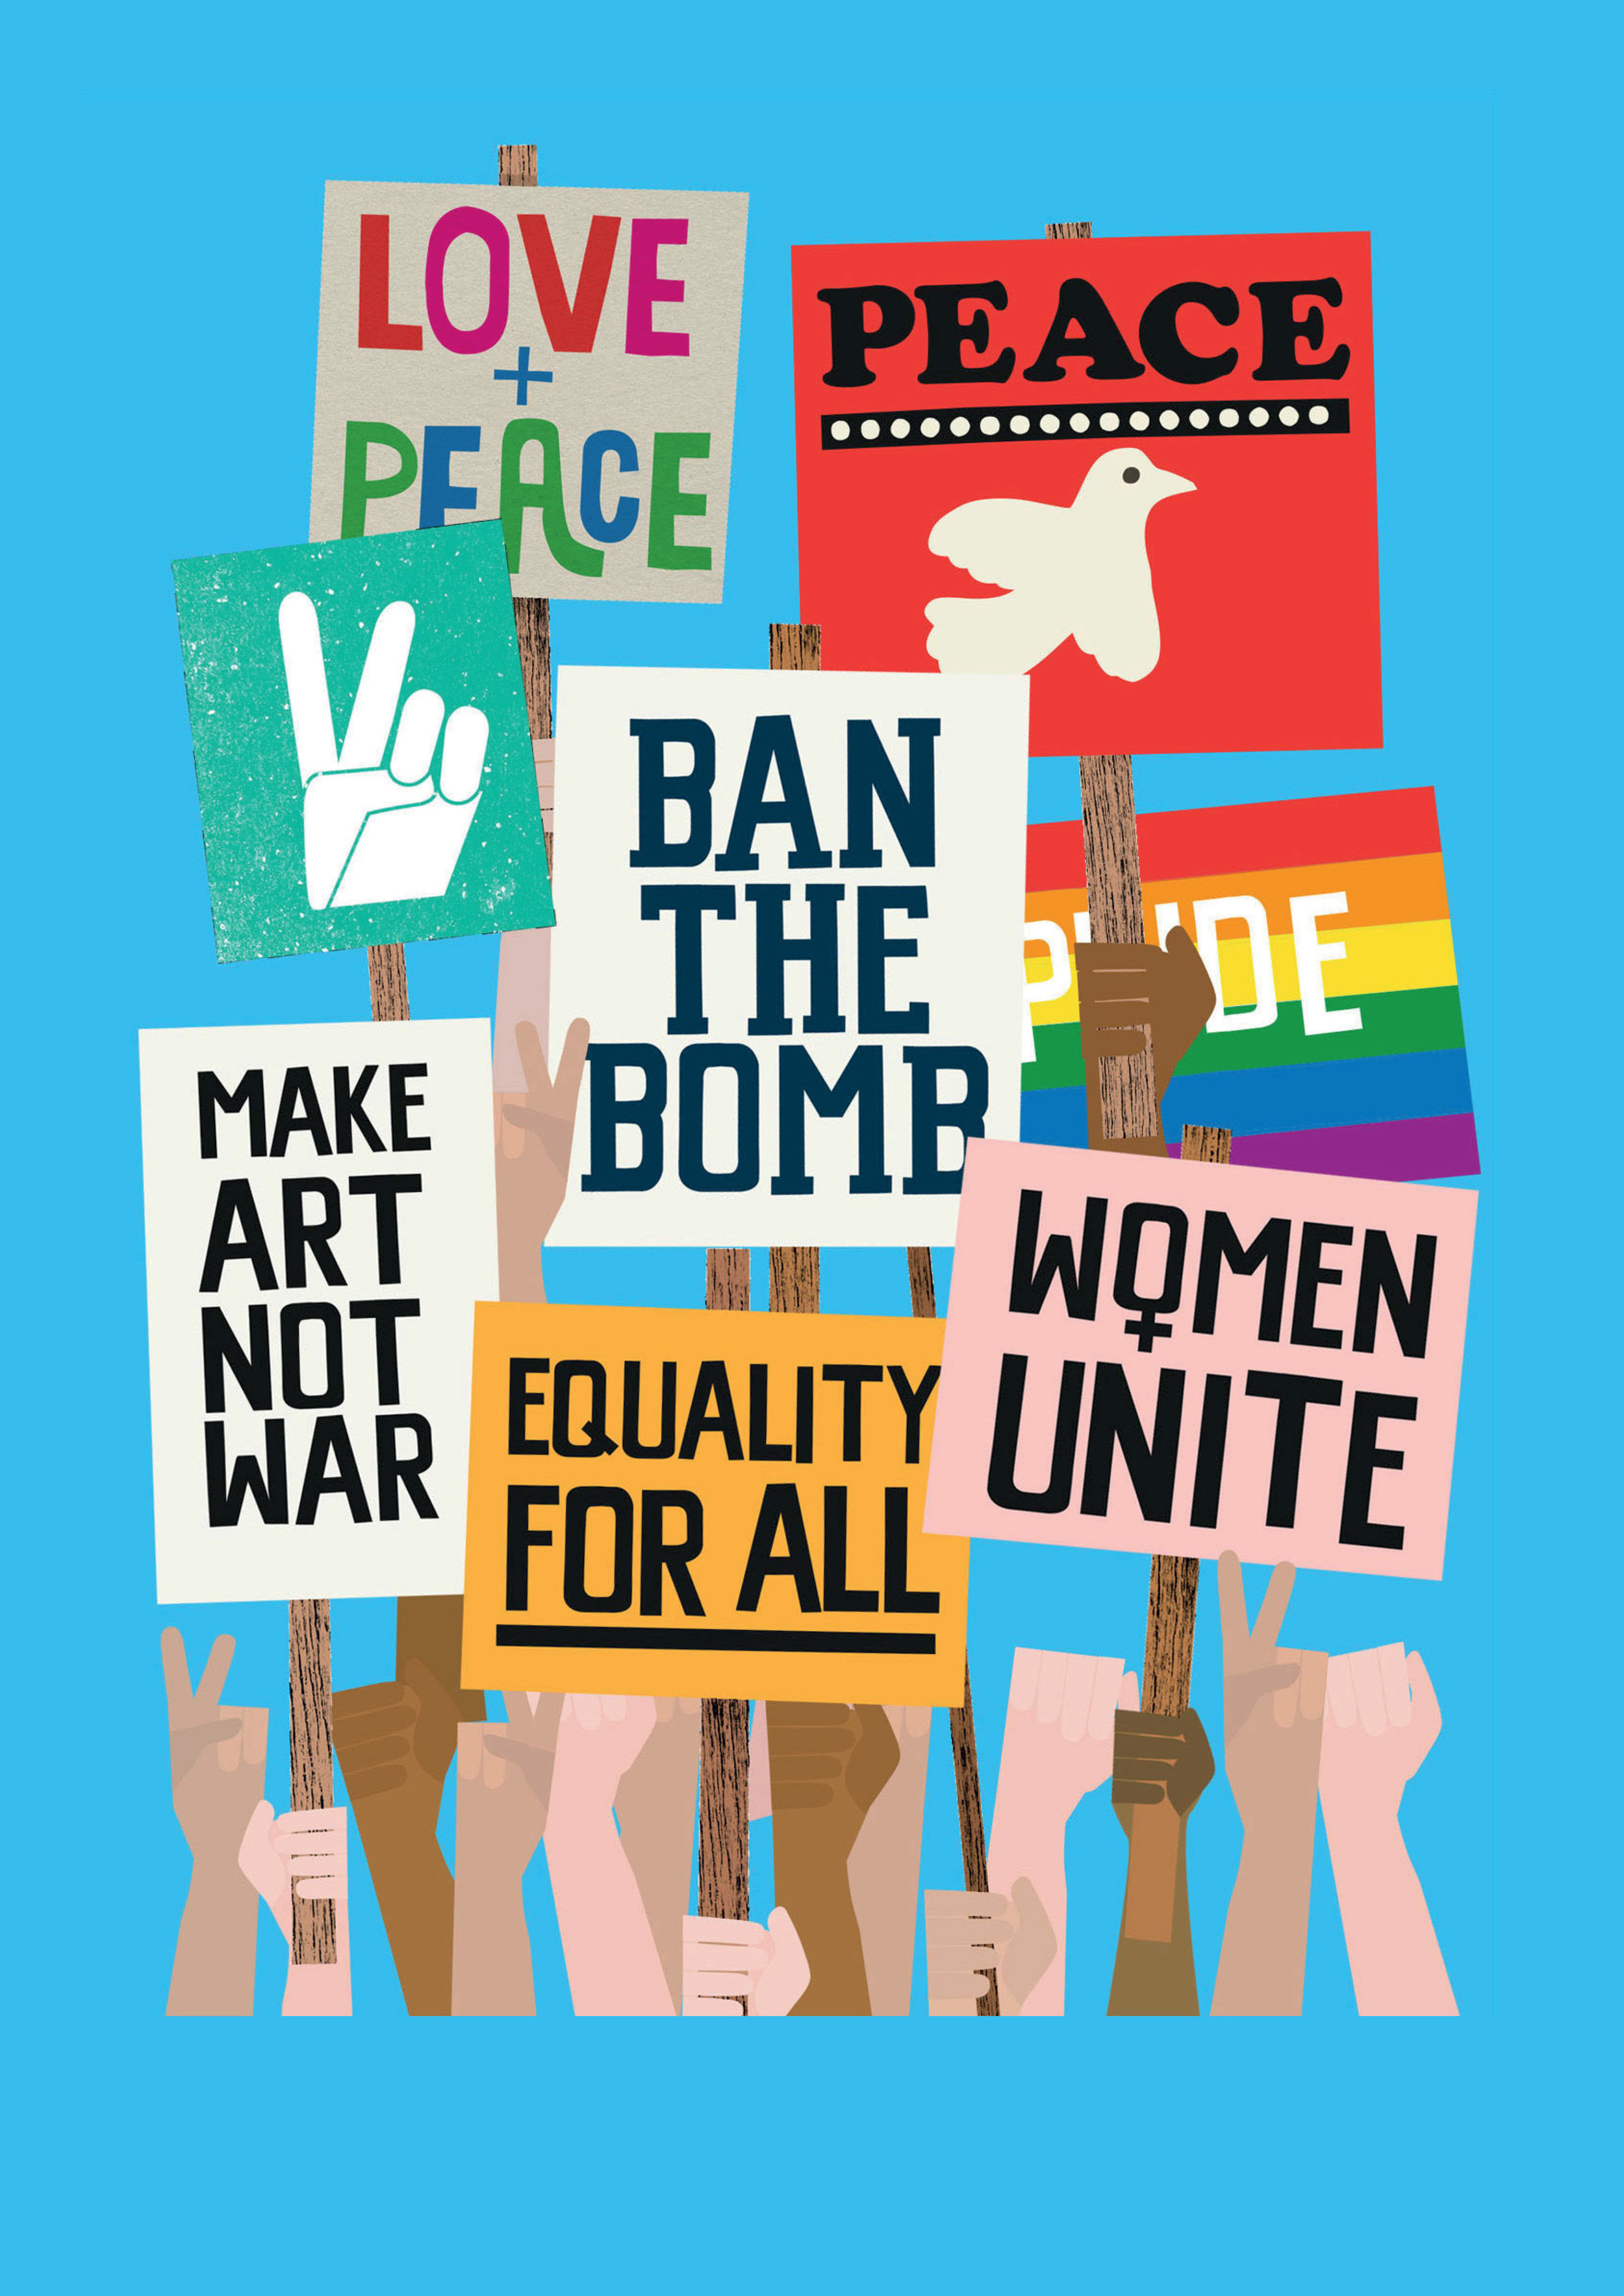 Marcus_Walters_V_AMuseum_Revolution_Print.jpg